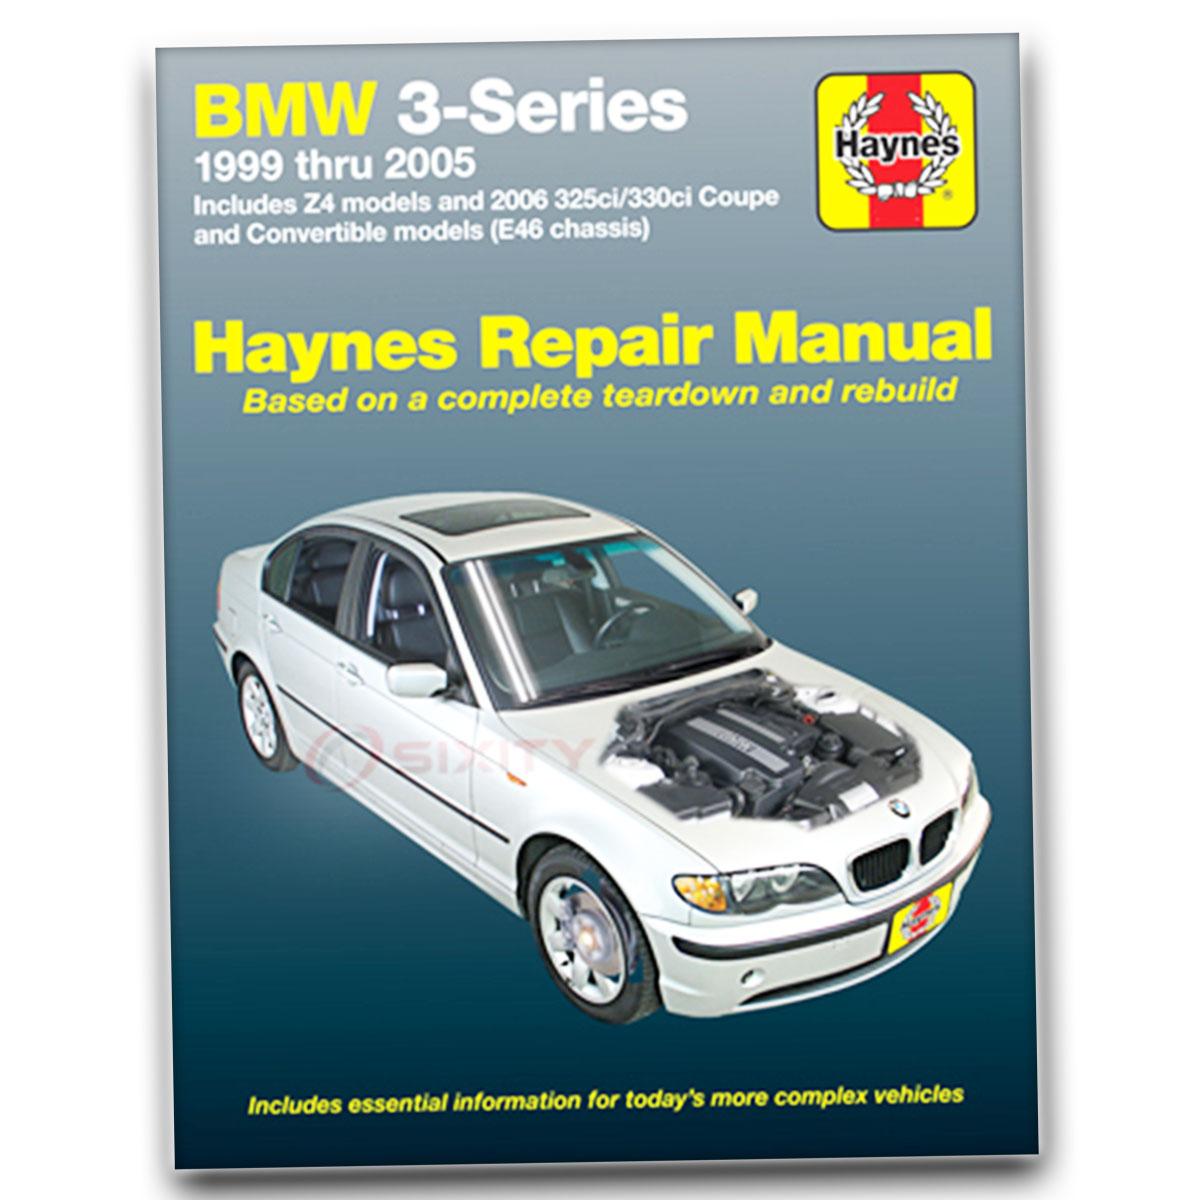 bmw 325i haynes repair manual base shop service garage book zx ebay rh ebay com Auto Repair Manuals Online Haynes Repair Manuals Mazda